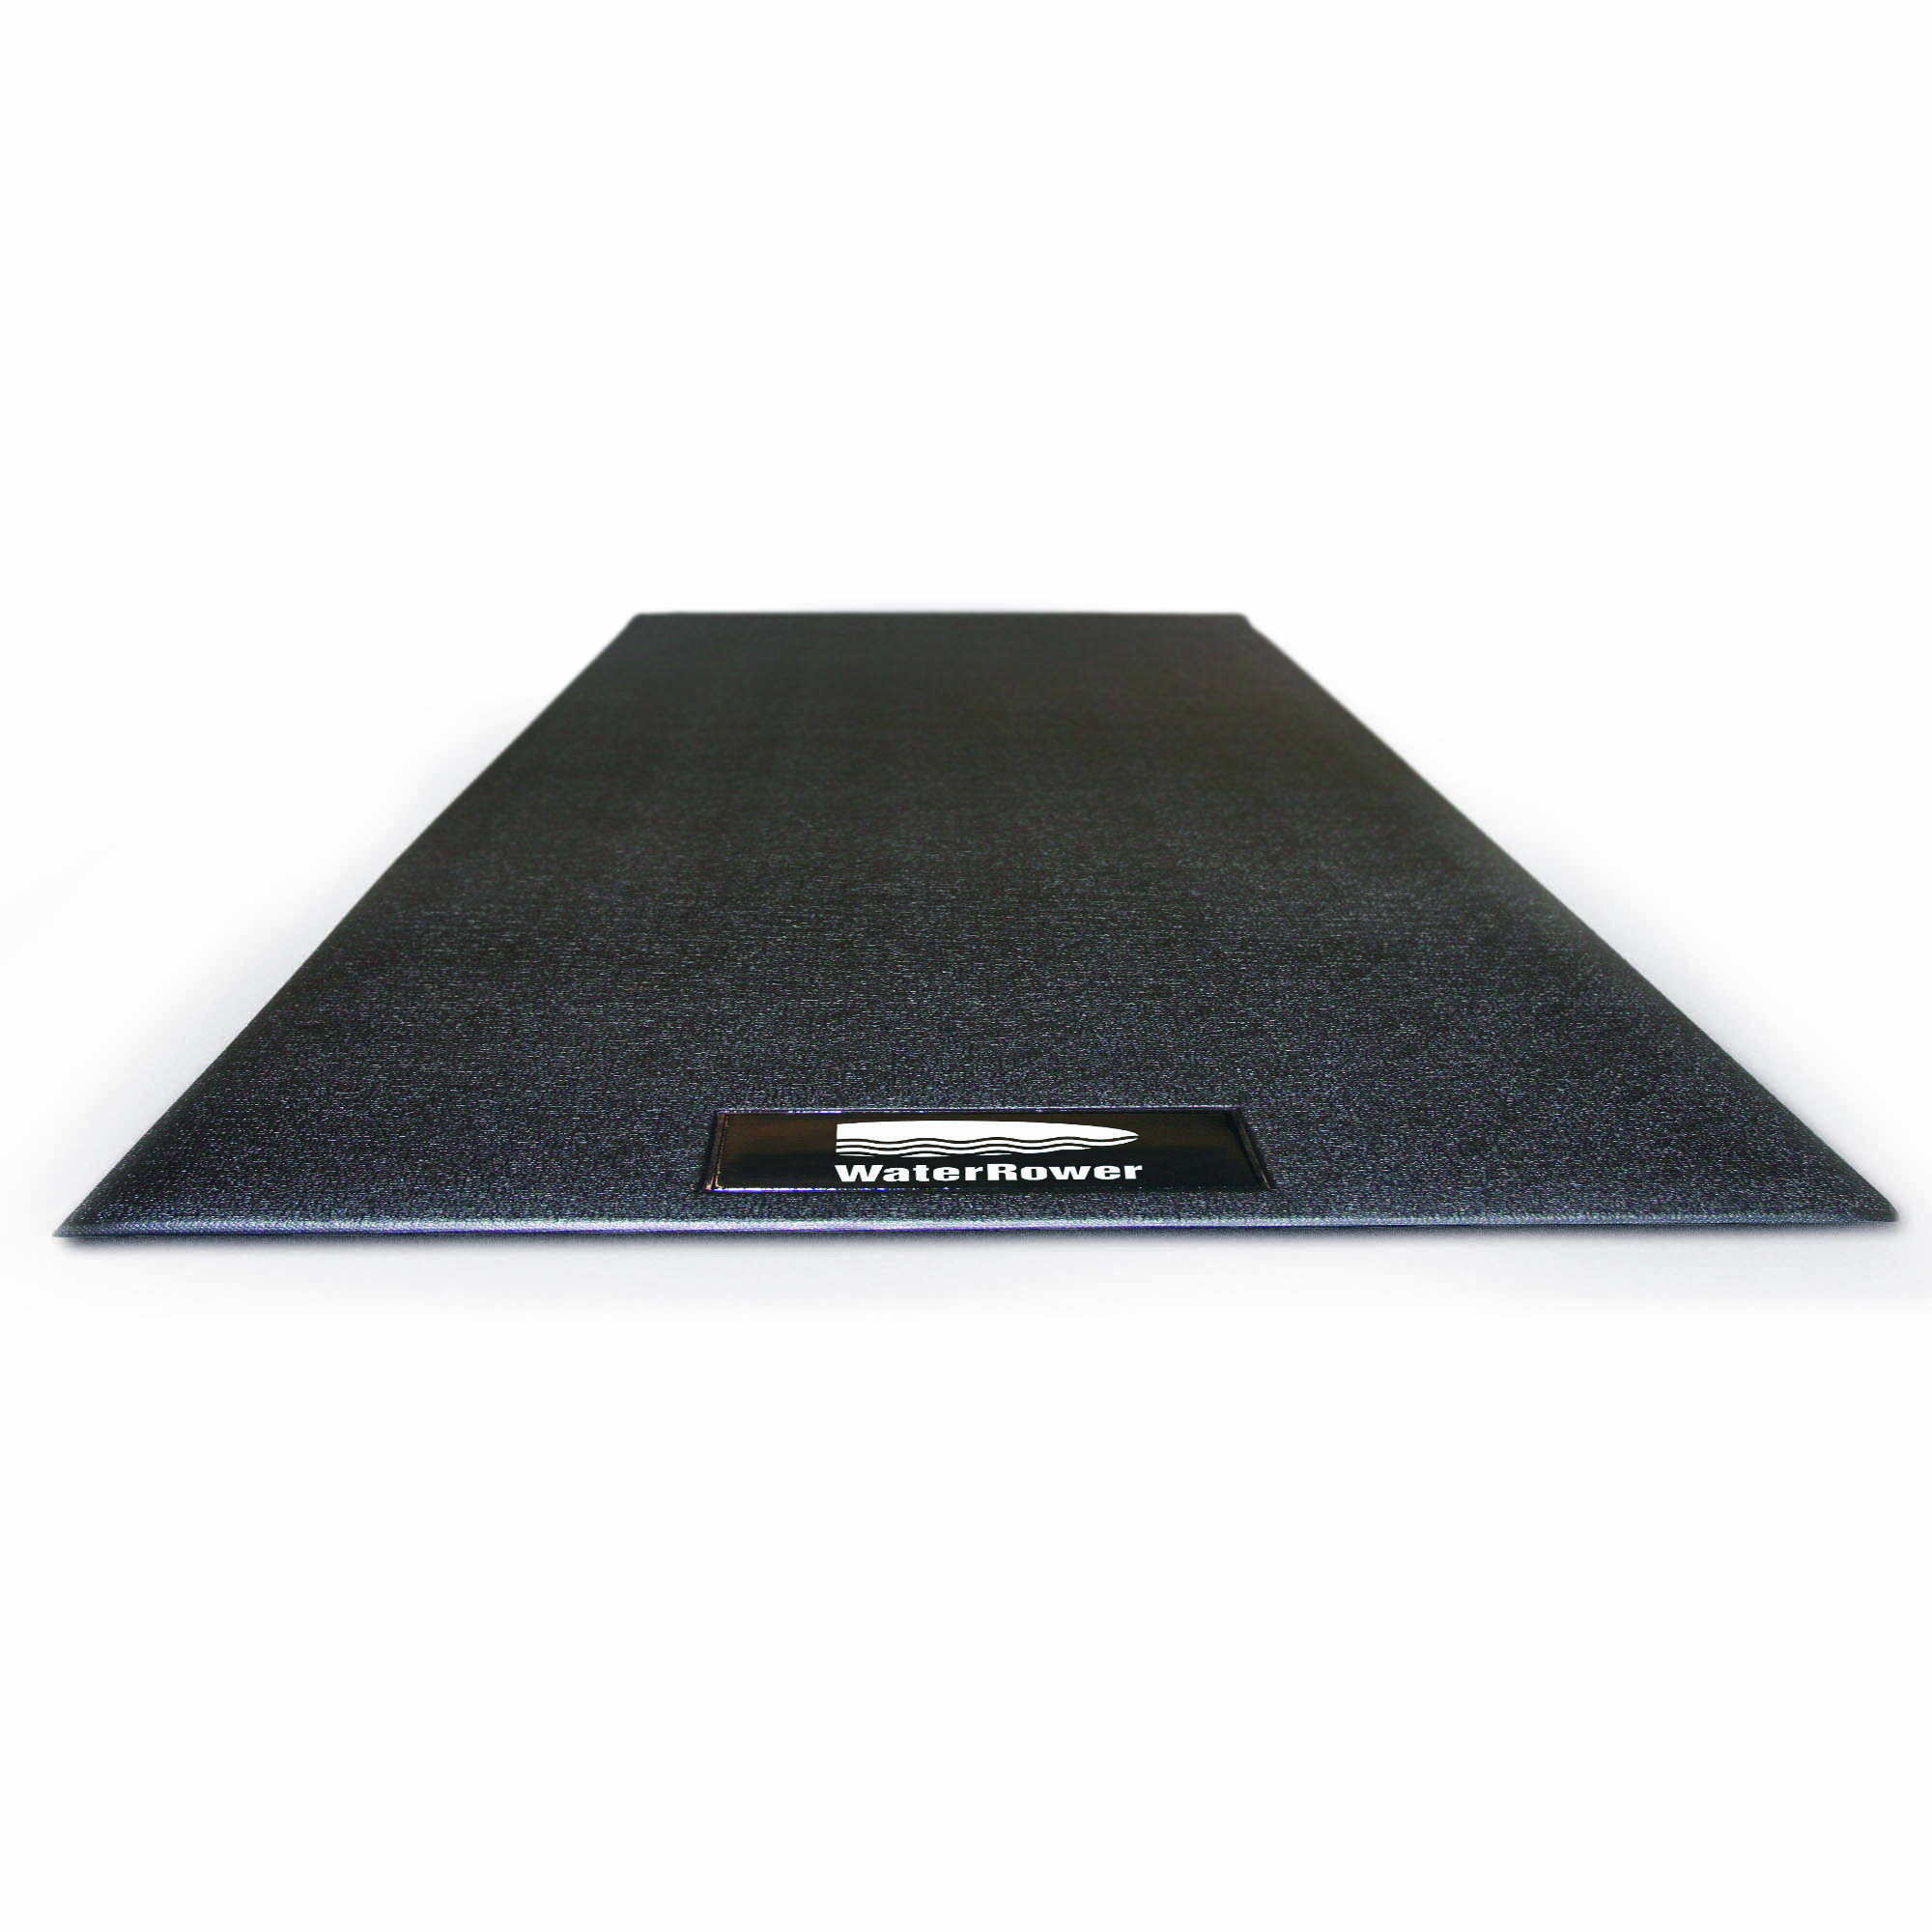 Floor Protection Rosin Paper Floor Protection Floor: Floor Protection Mats